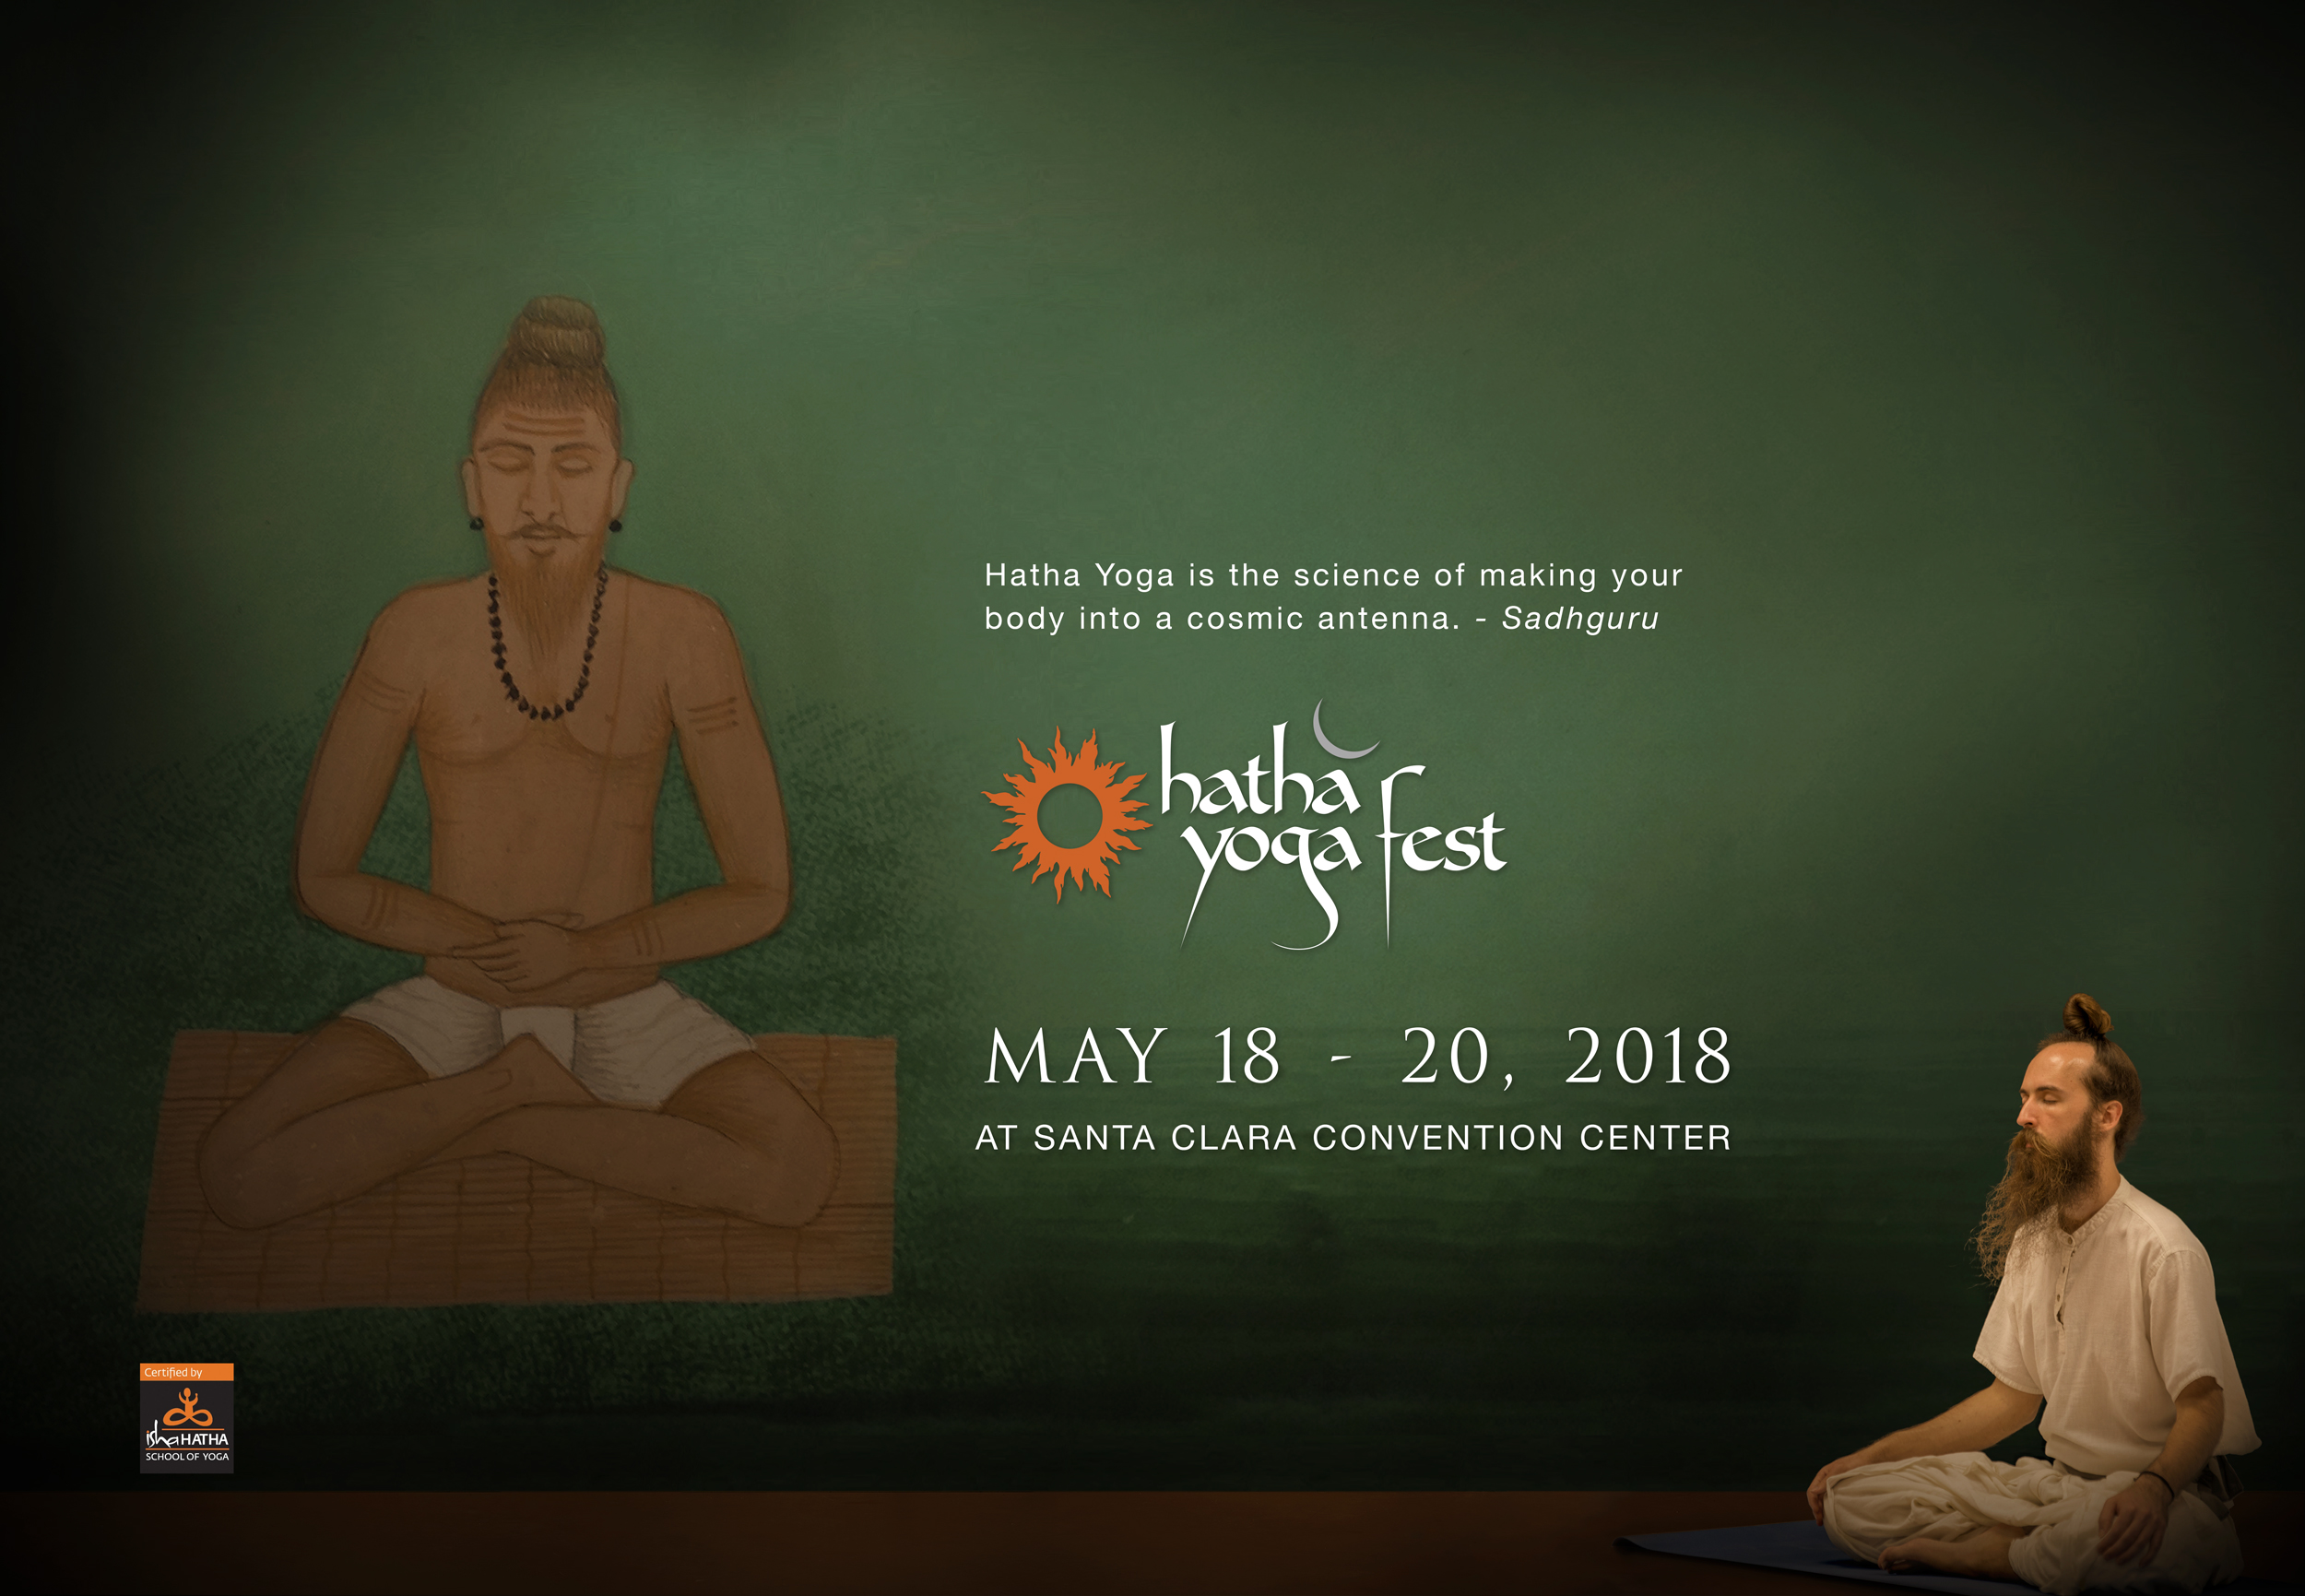 hatha_yoga_fest_cover_final.jpg